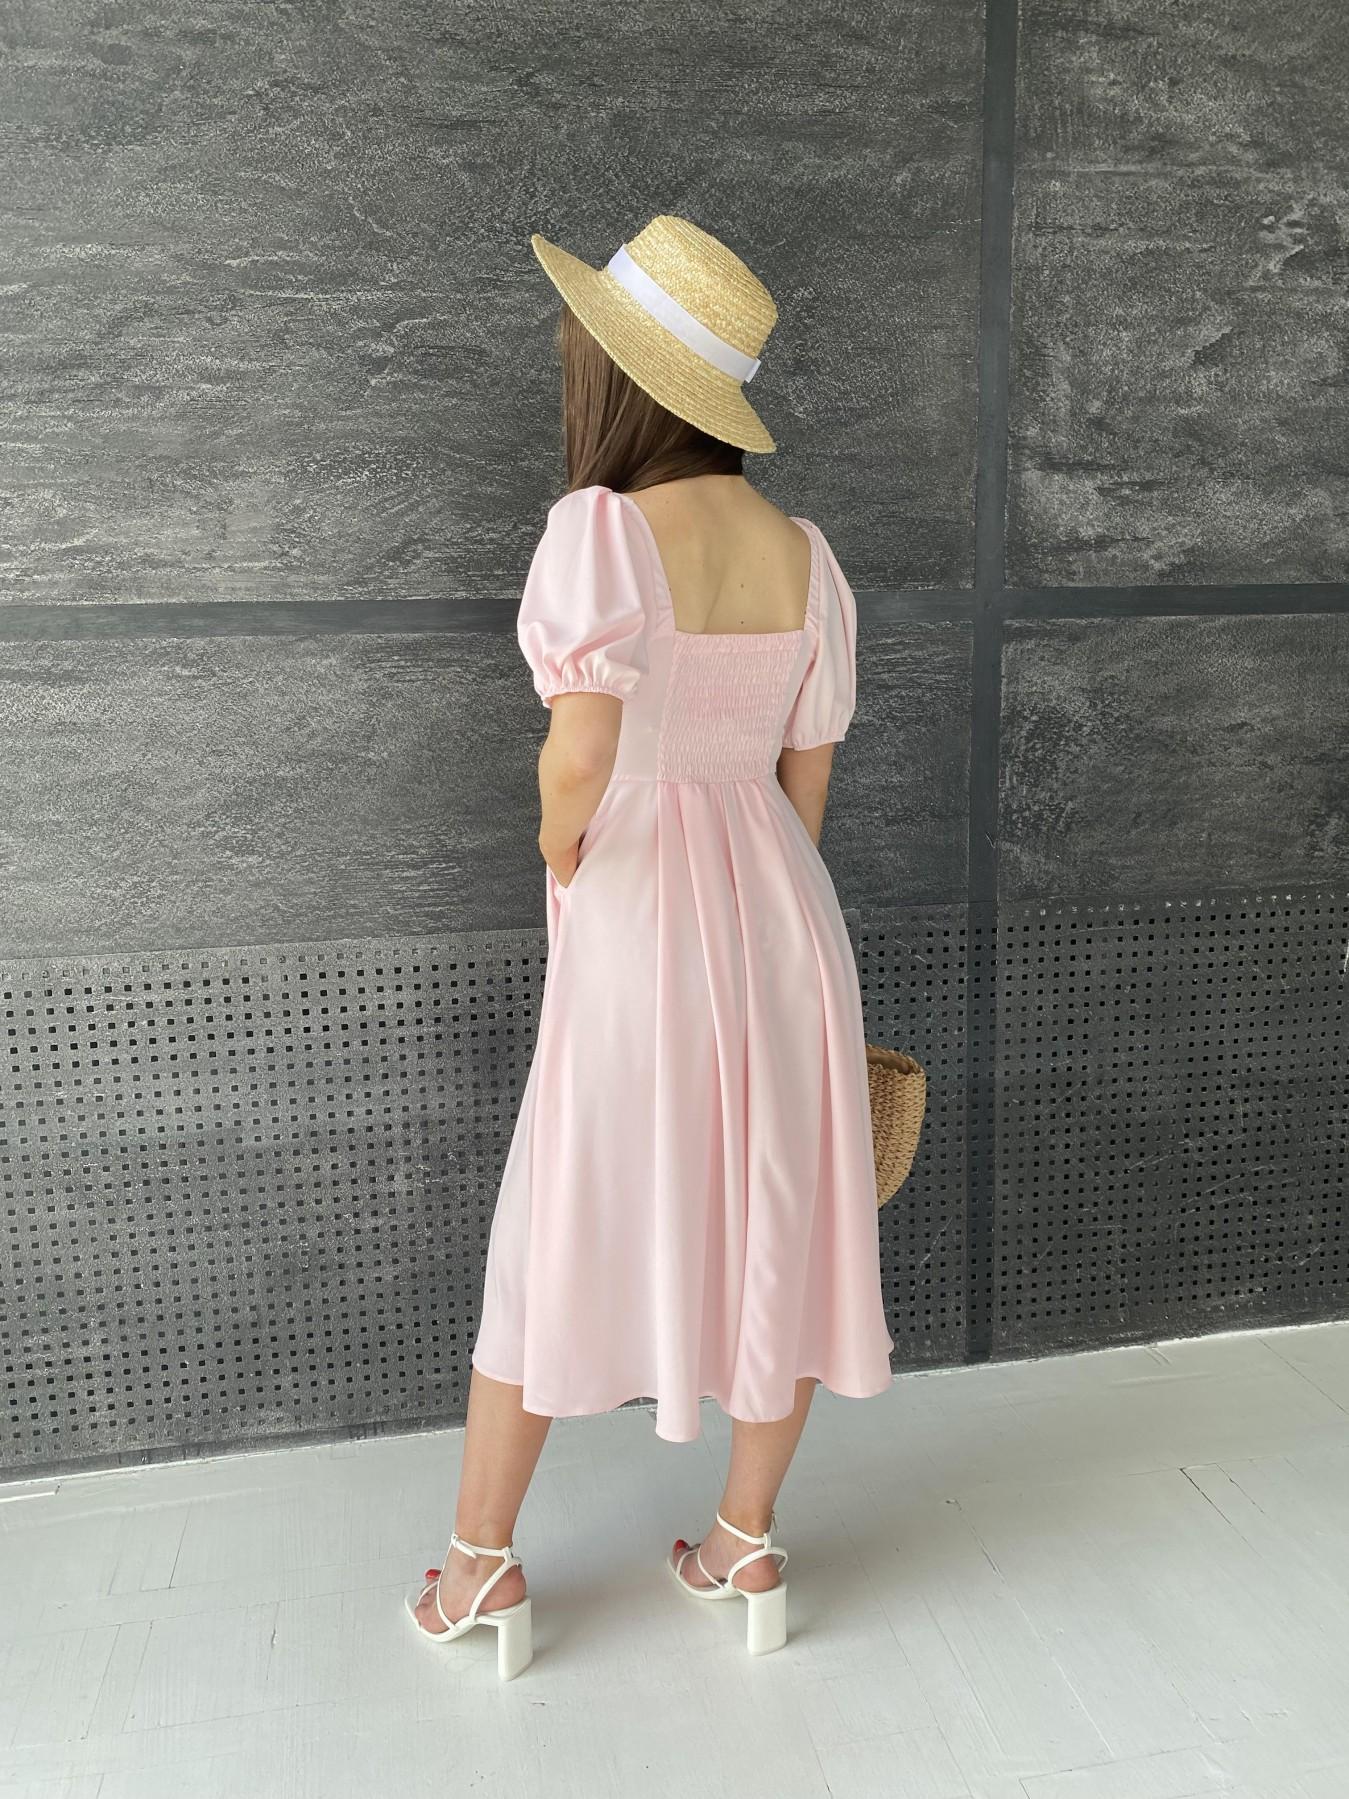 Кисес Миди платье  софт 11540 АРТ. 48193 Цвет: Пудра 13 - фото 2, интернет магазин tm-modus.ru